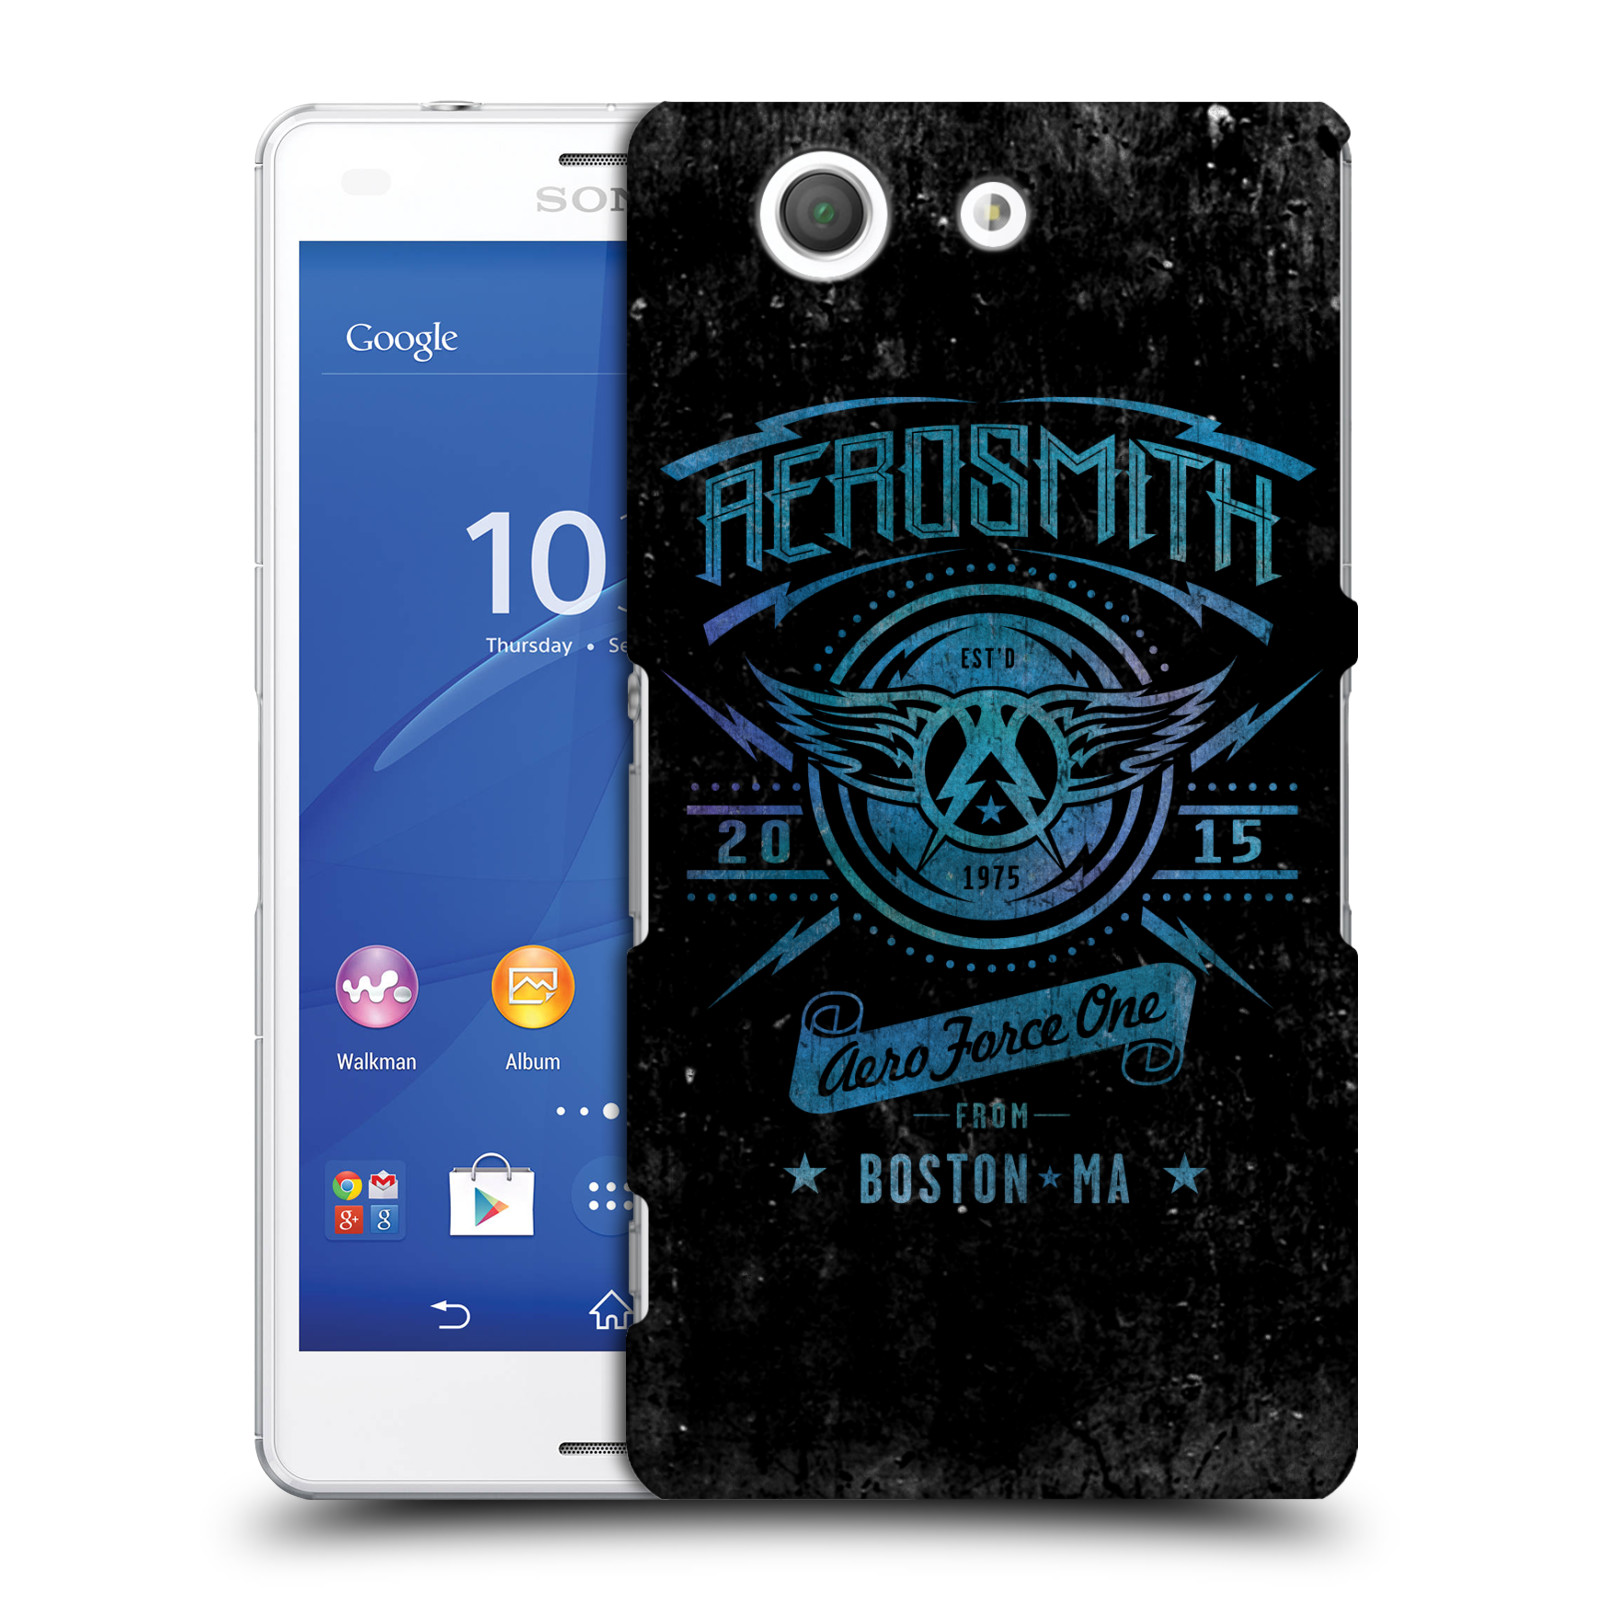 Plastové pouzdro na mobil Sony Xperia Z3 Compact D5803 HEAD CASE - Aerosmith - Aero Force One